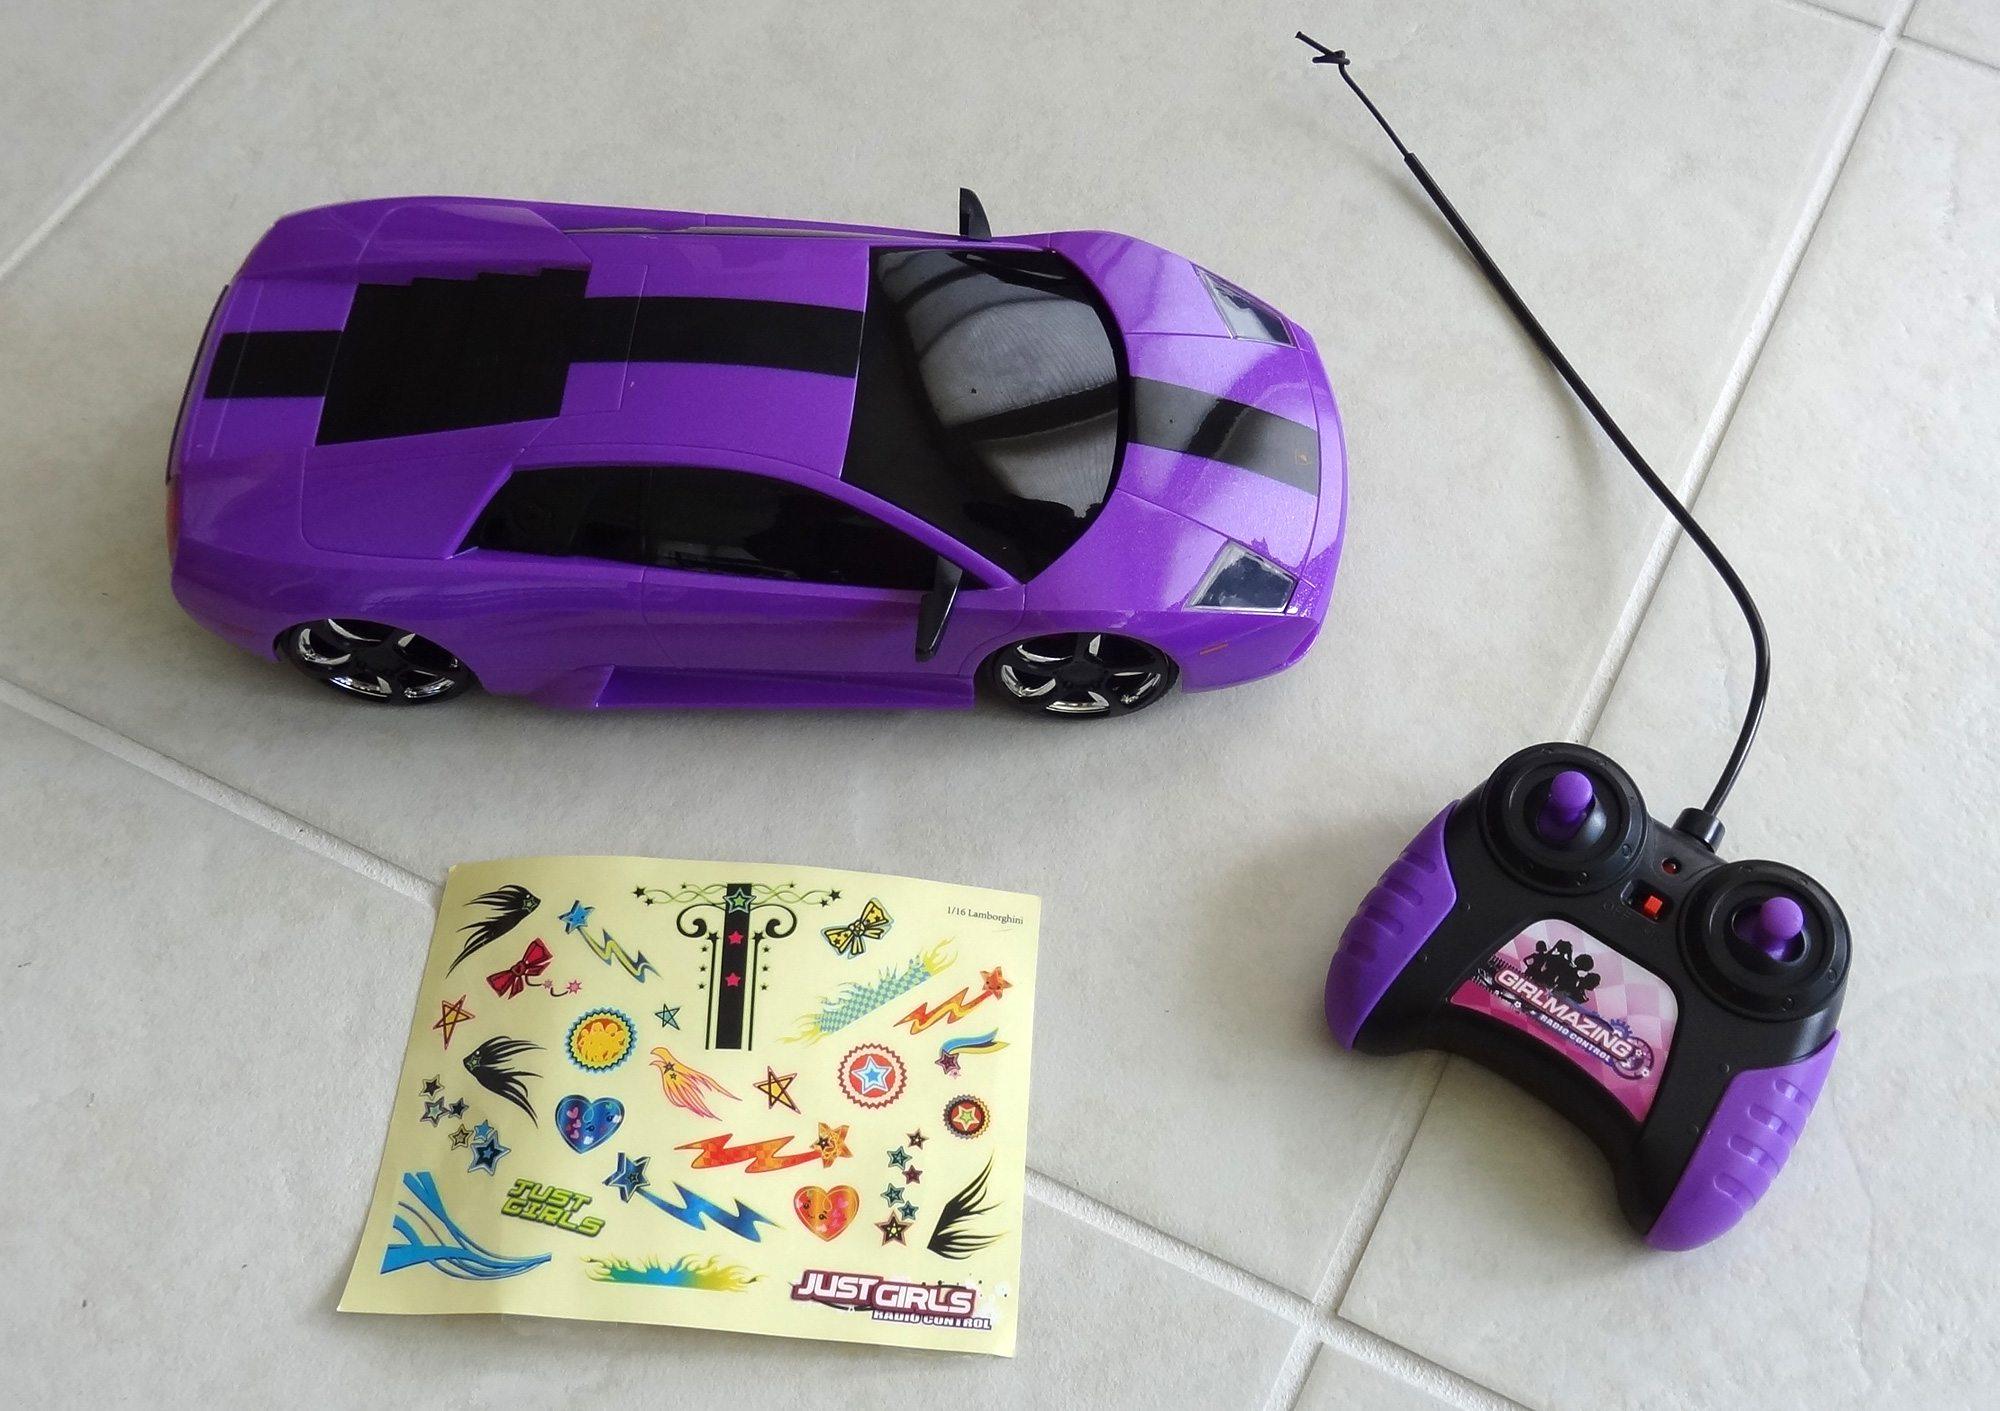 Girlmazing Lamborghini